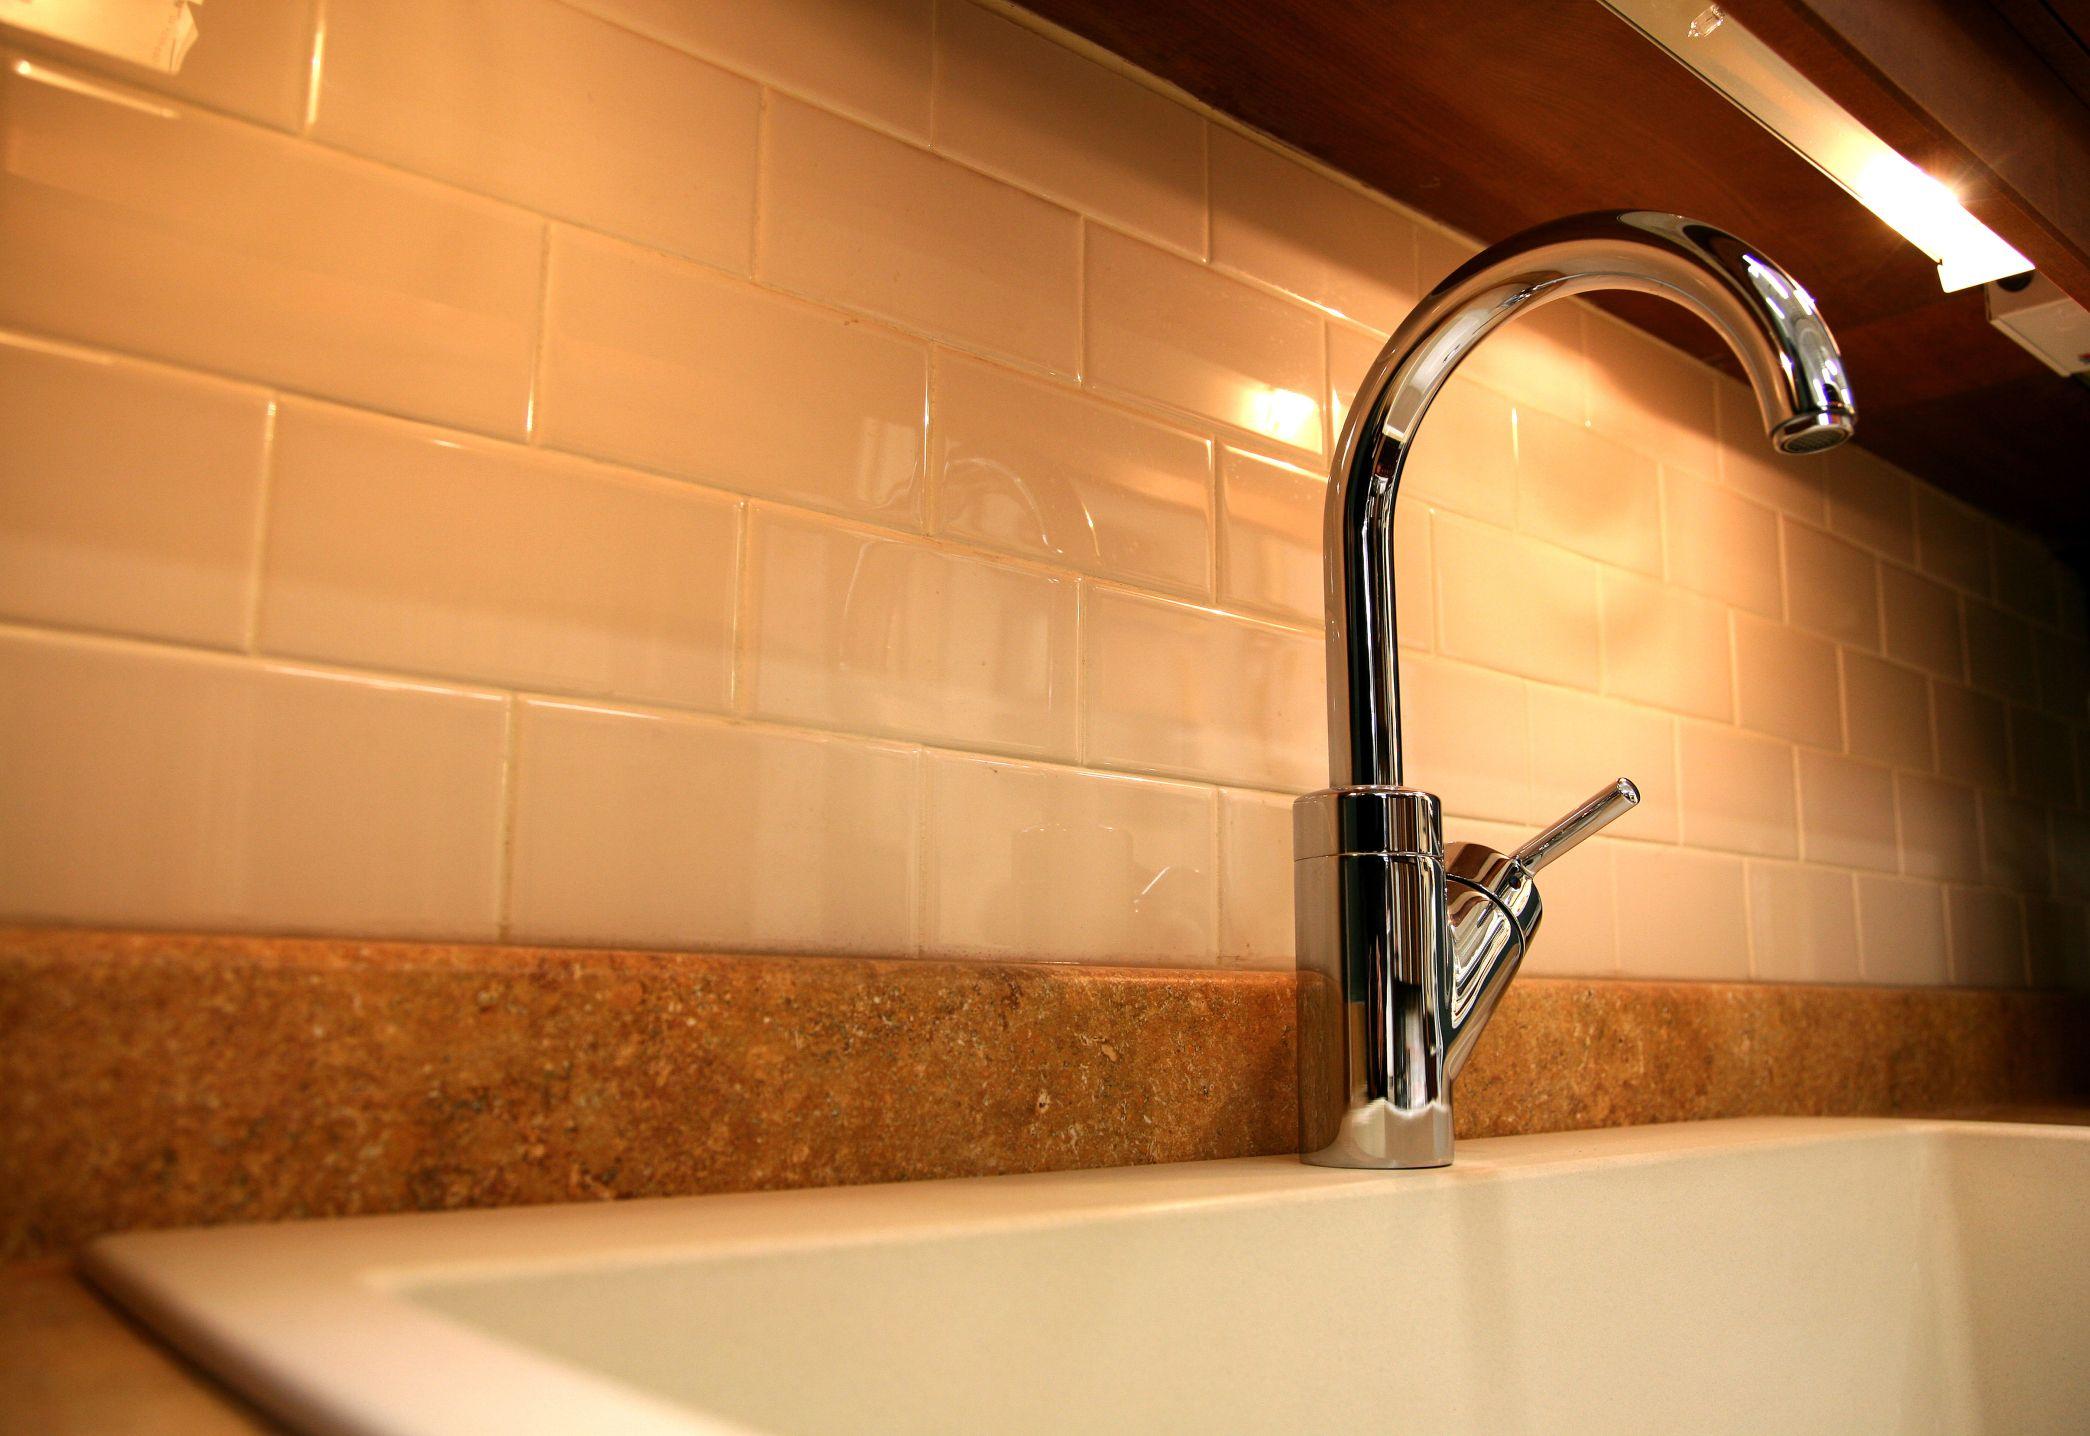 How to Cover an Unattractive Gap Between a Granite ... on Best Backsplash For Granite Countertops  id=69487